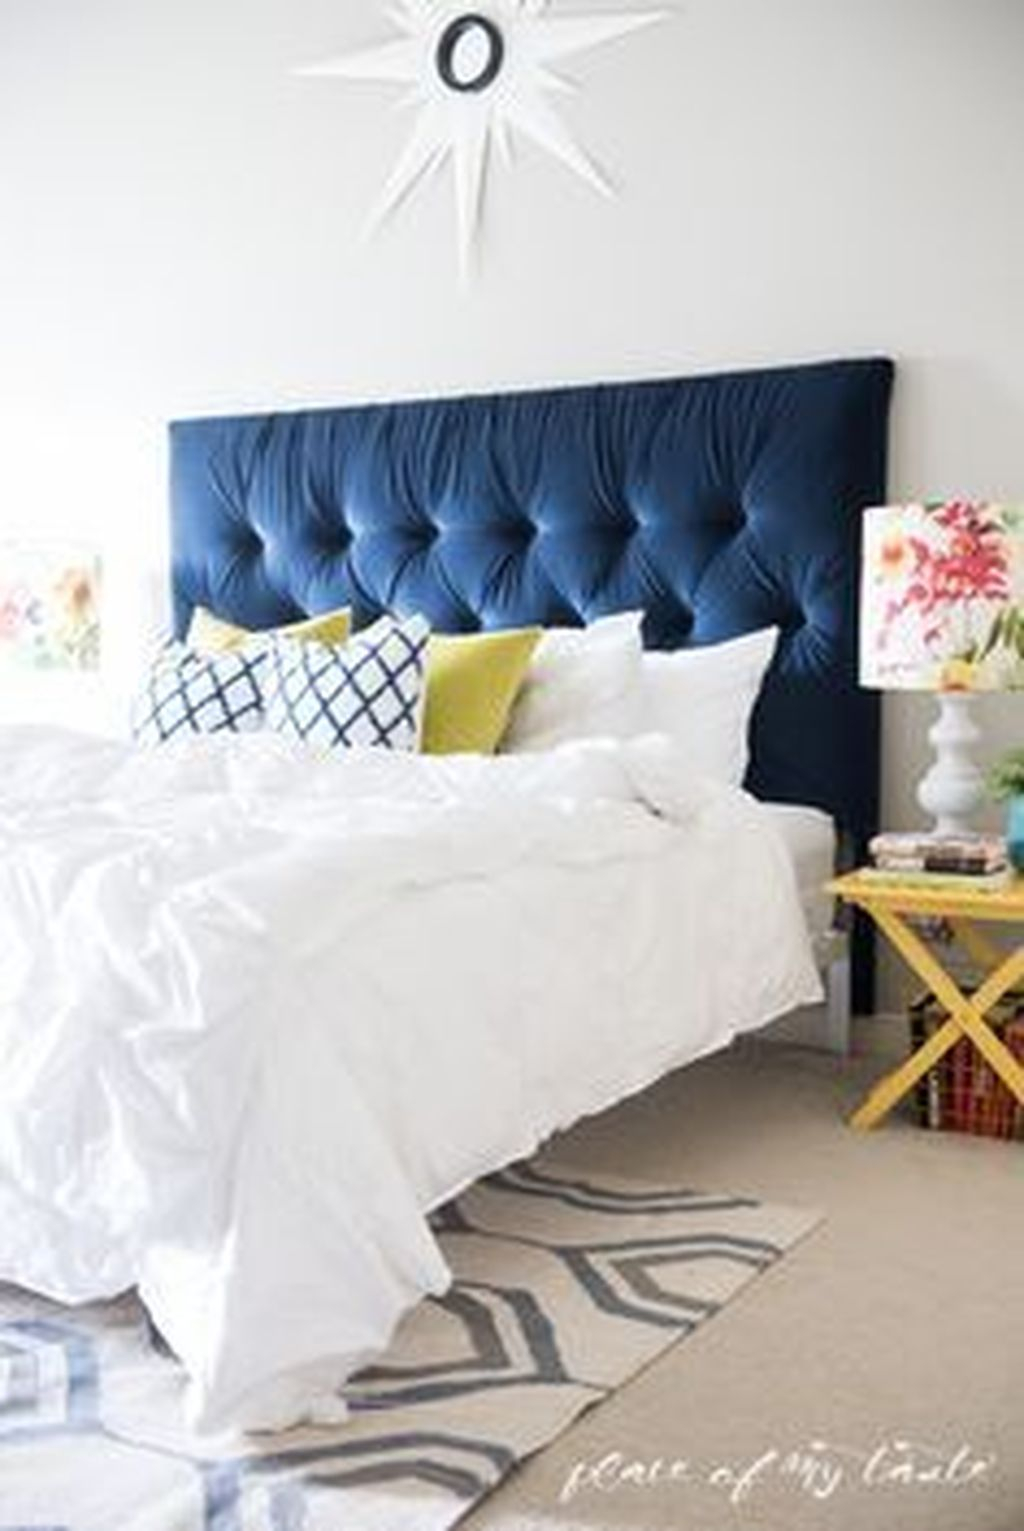 Stylish Diy Bedroom Headboard Design Ideas That Will Inspire You 35